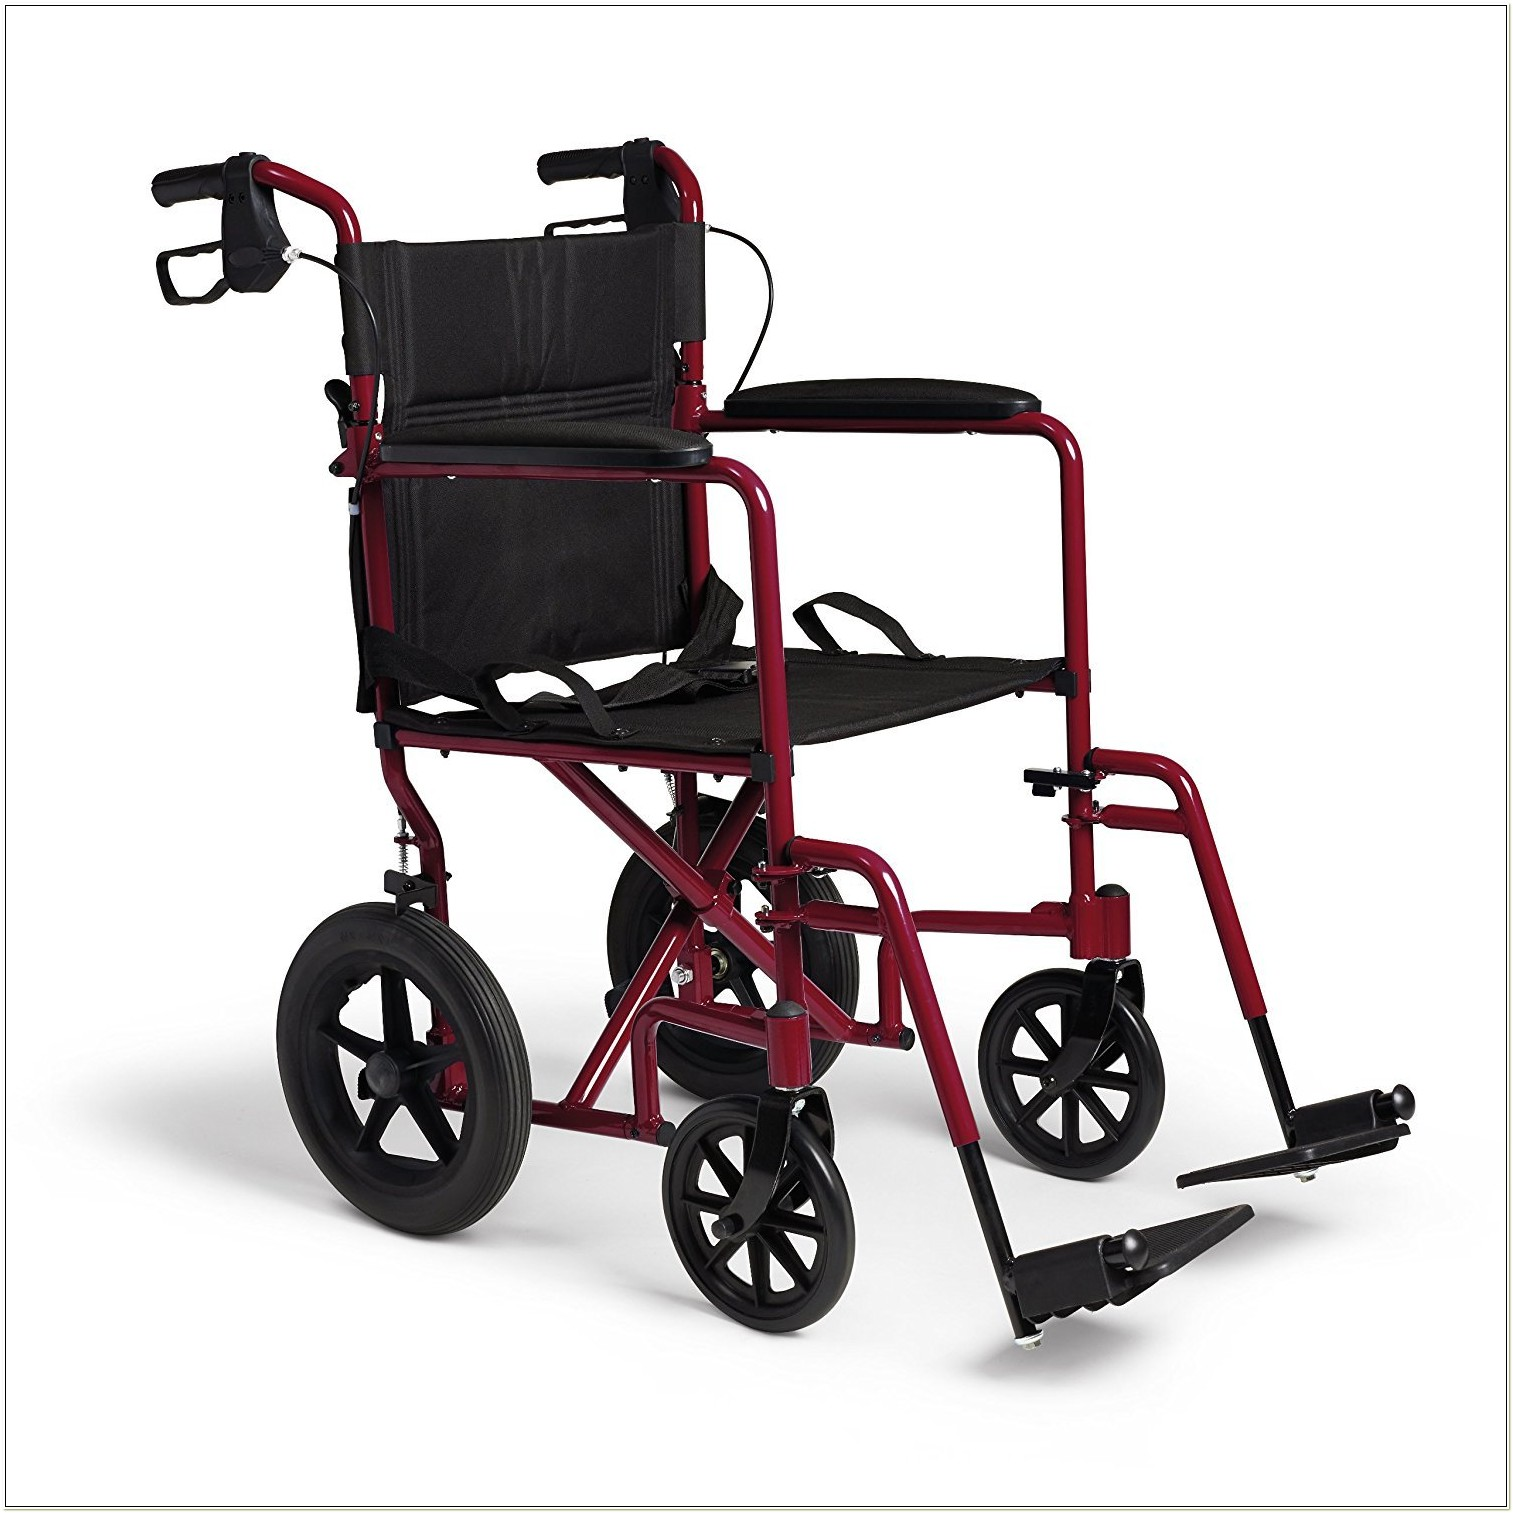 Invacare Lightweight Folding Transport Wheelchair